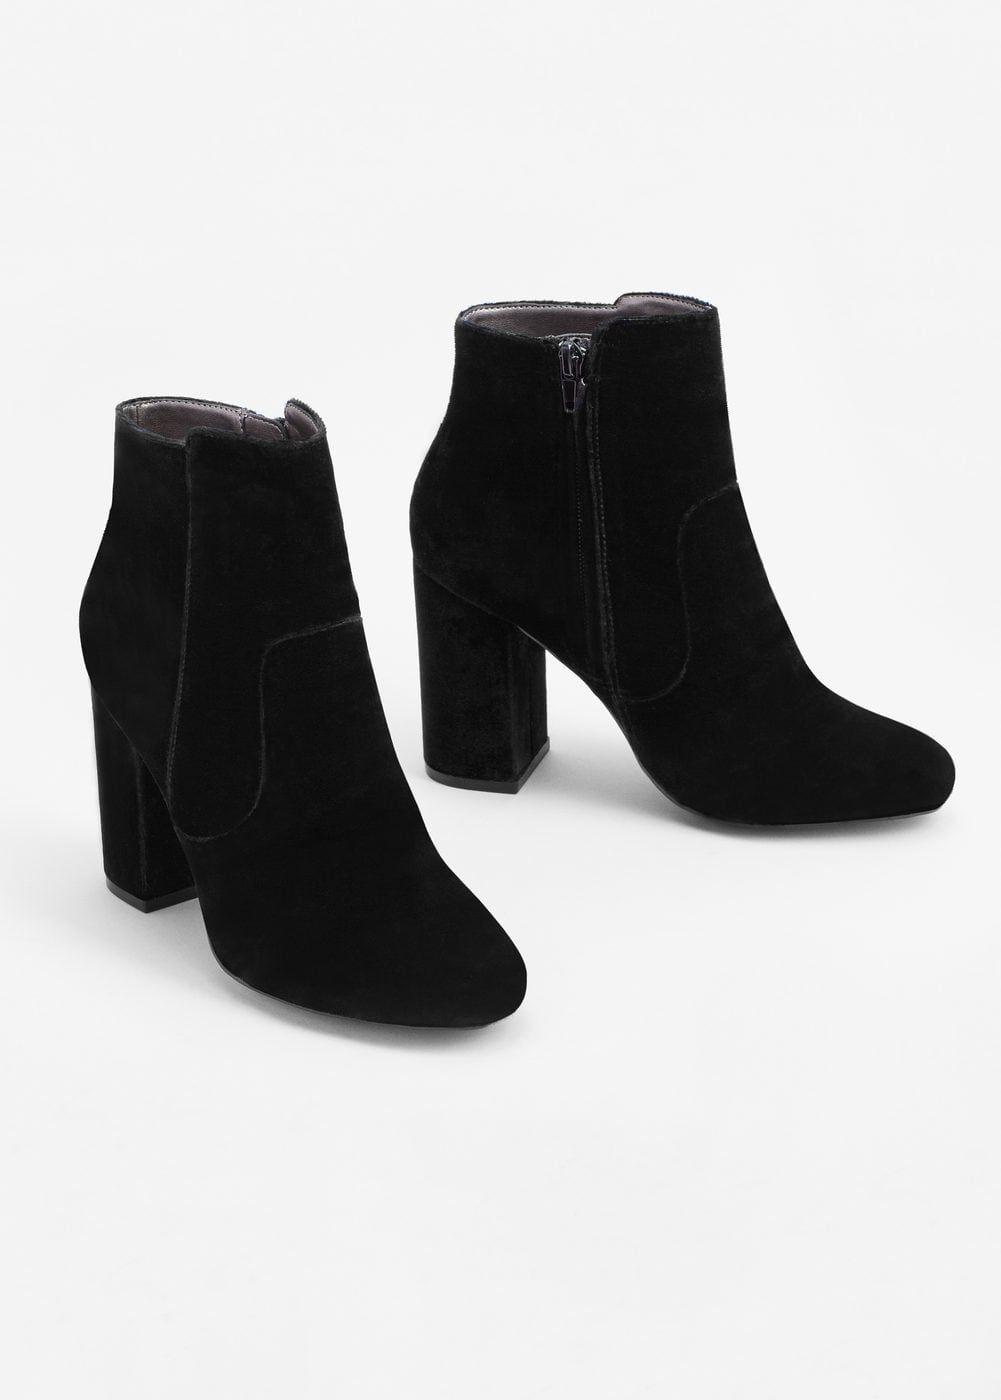 Bottines velours à talons - Femme   REPERAGES SOLDES   Chaussure ... 274b3a78fa3c